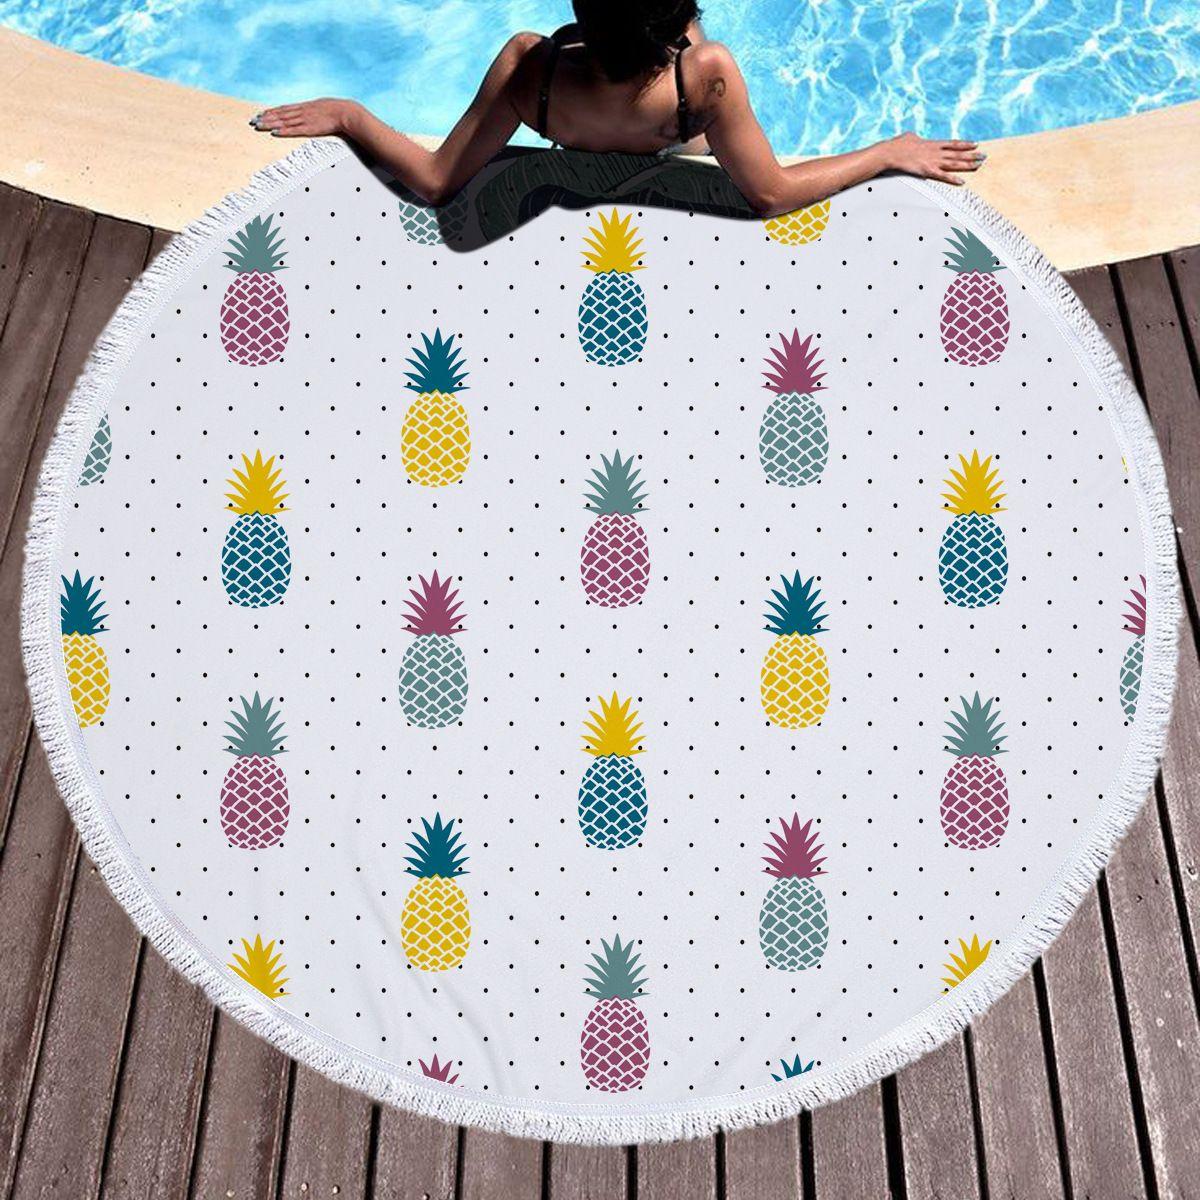 Fruit Pineapple Large Tassel Beach Towel Throw Microfiber Adults ...